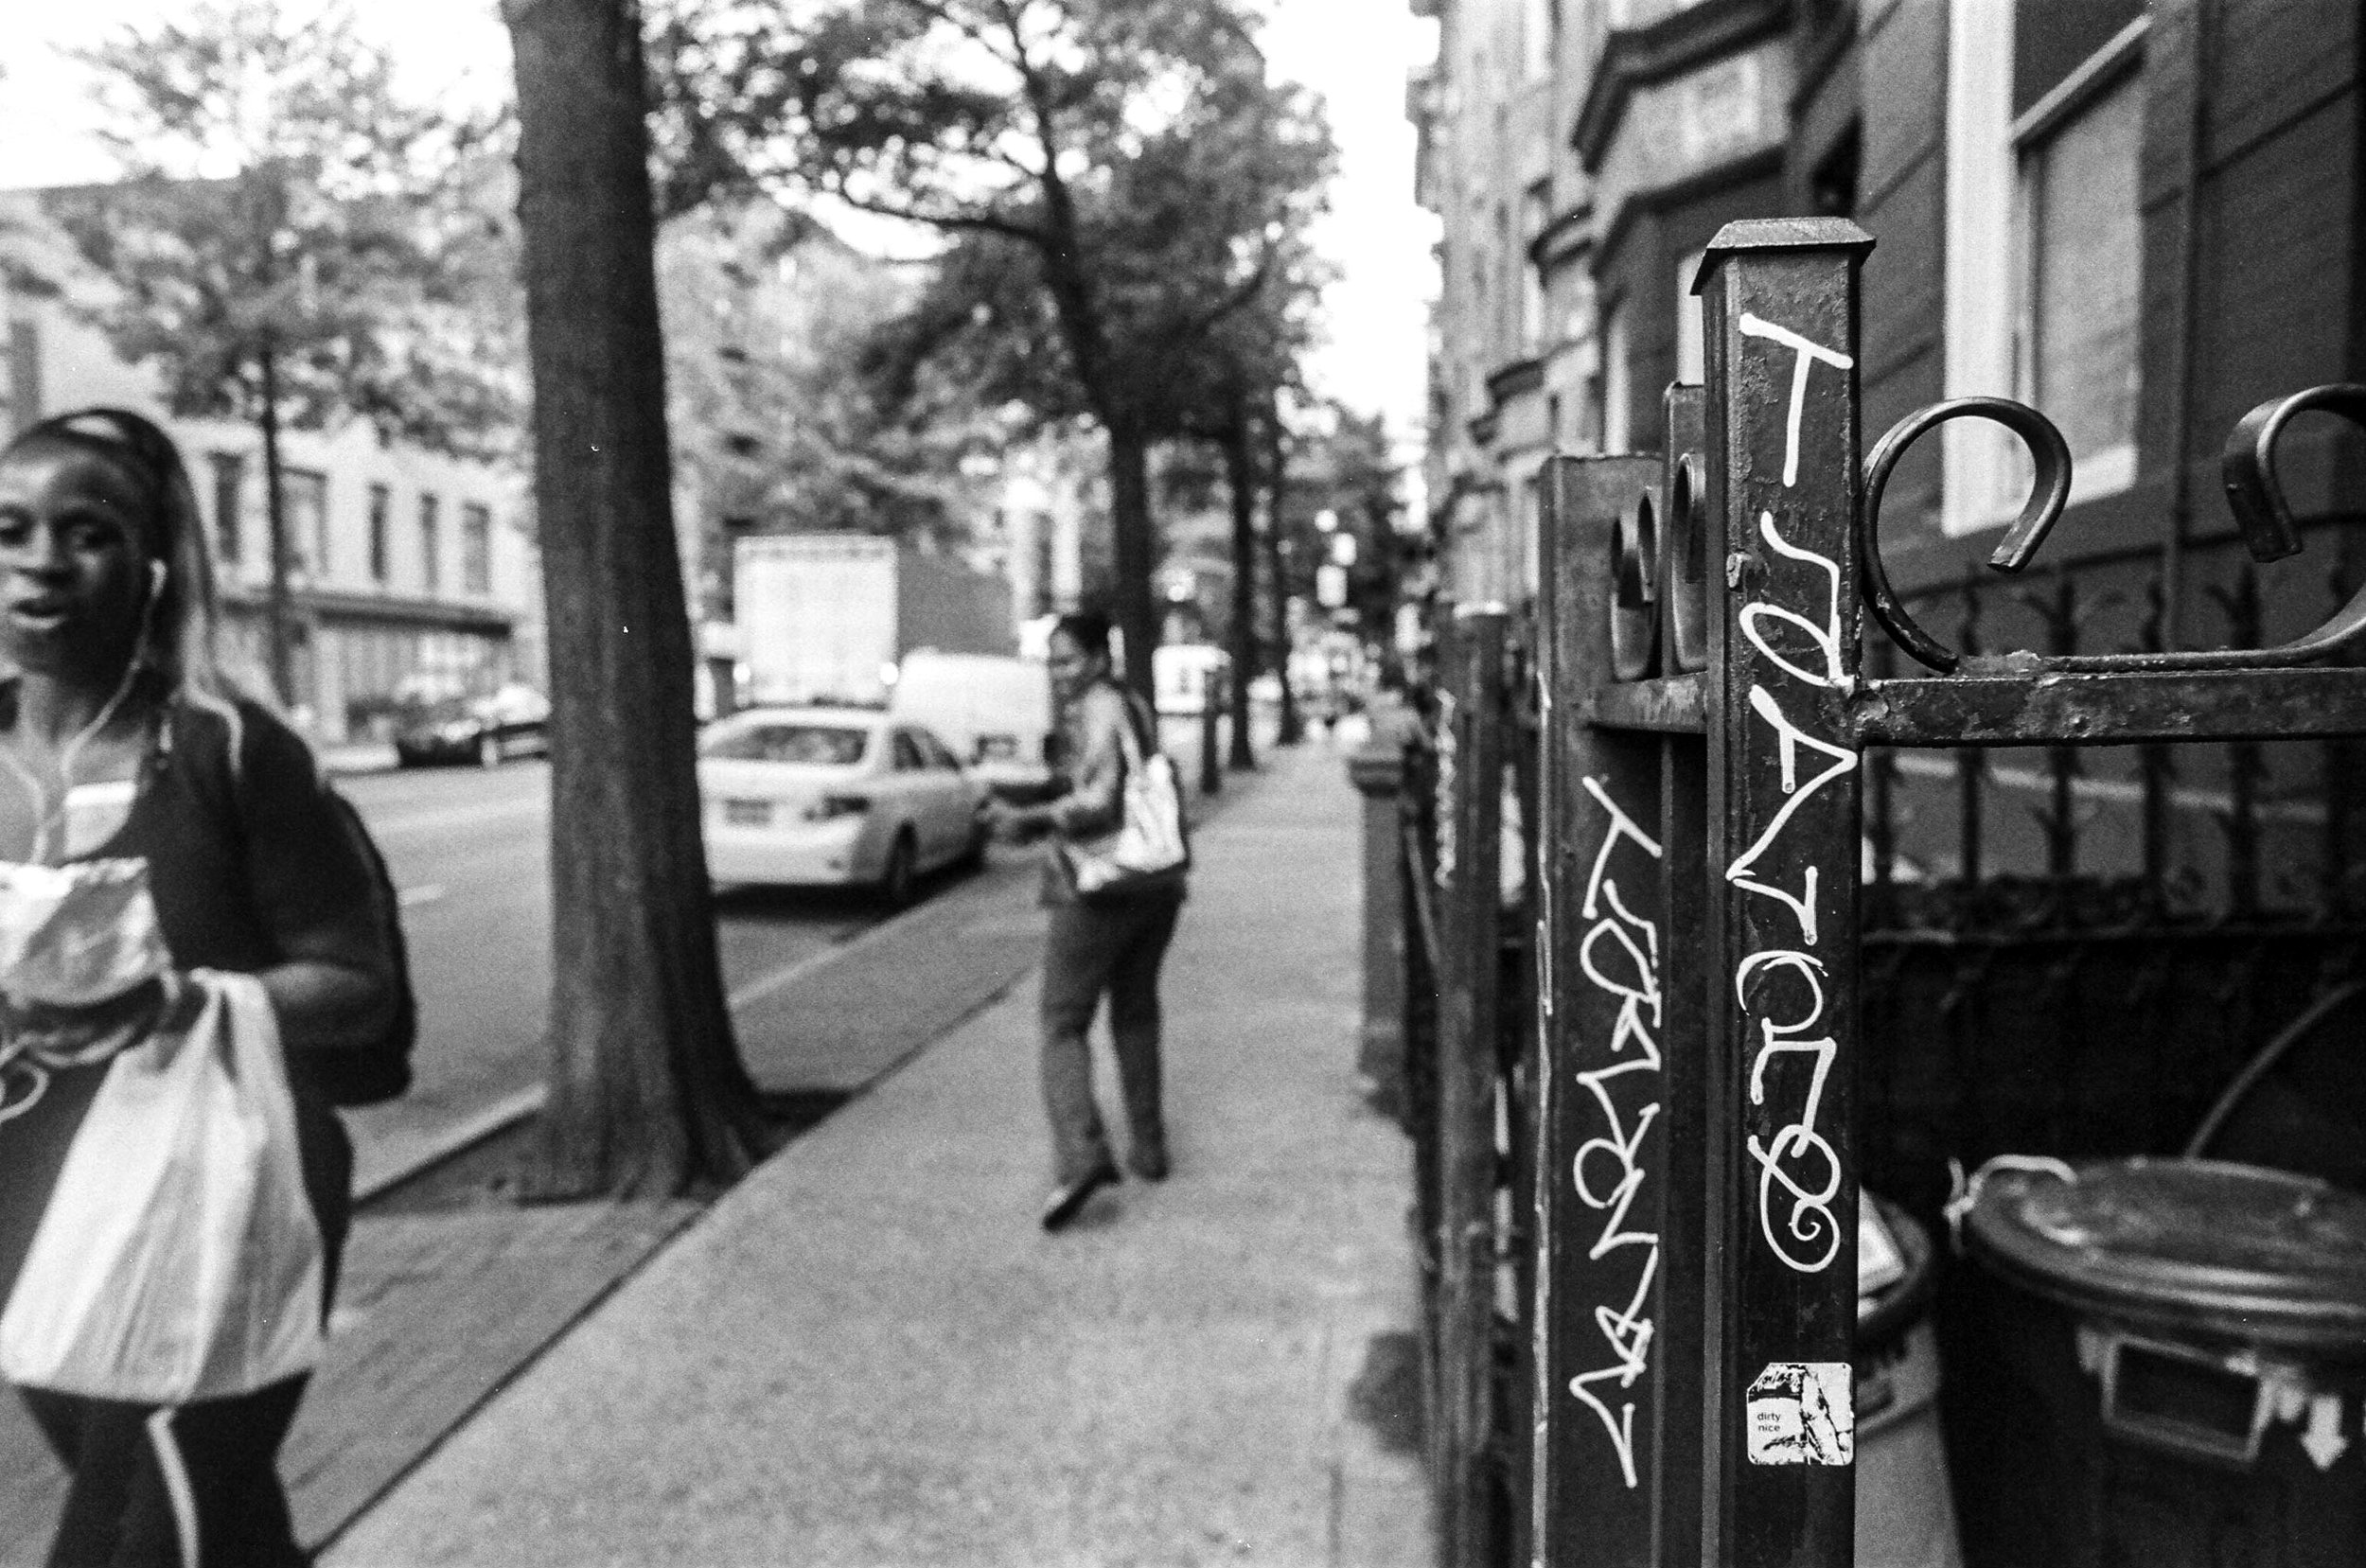 Stoop Tag, Flatbush, Brooklyn_Film Photography_NYC_Joe Curry Photography_2018.jpg